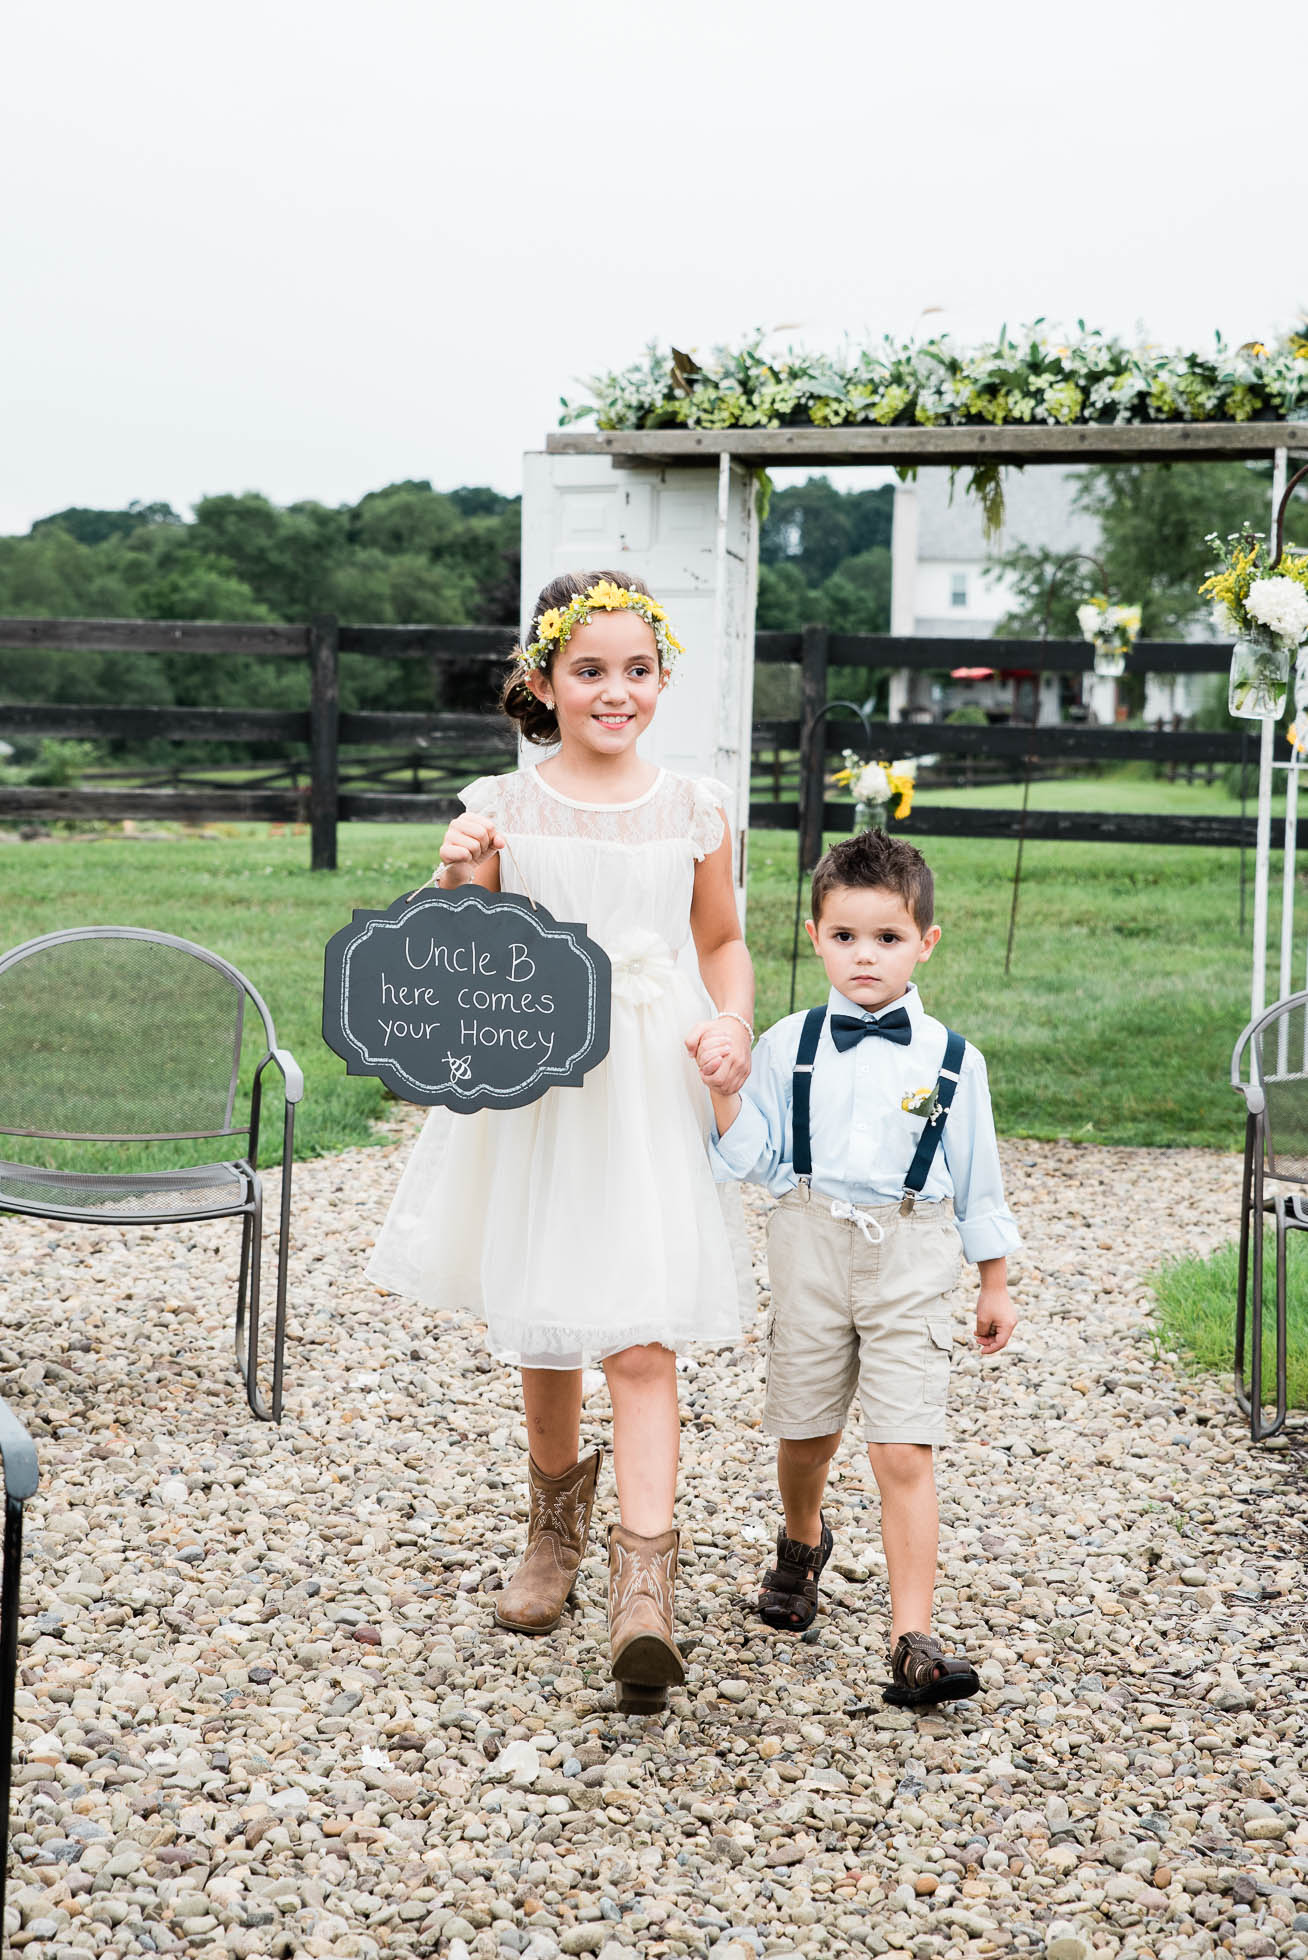 The Hayloft of PA, wedding ceremony Mariah Fisher, Pittsburgh PA wedding photographer-13.jpg